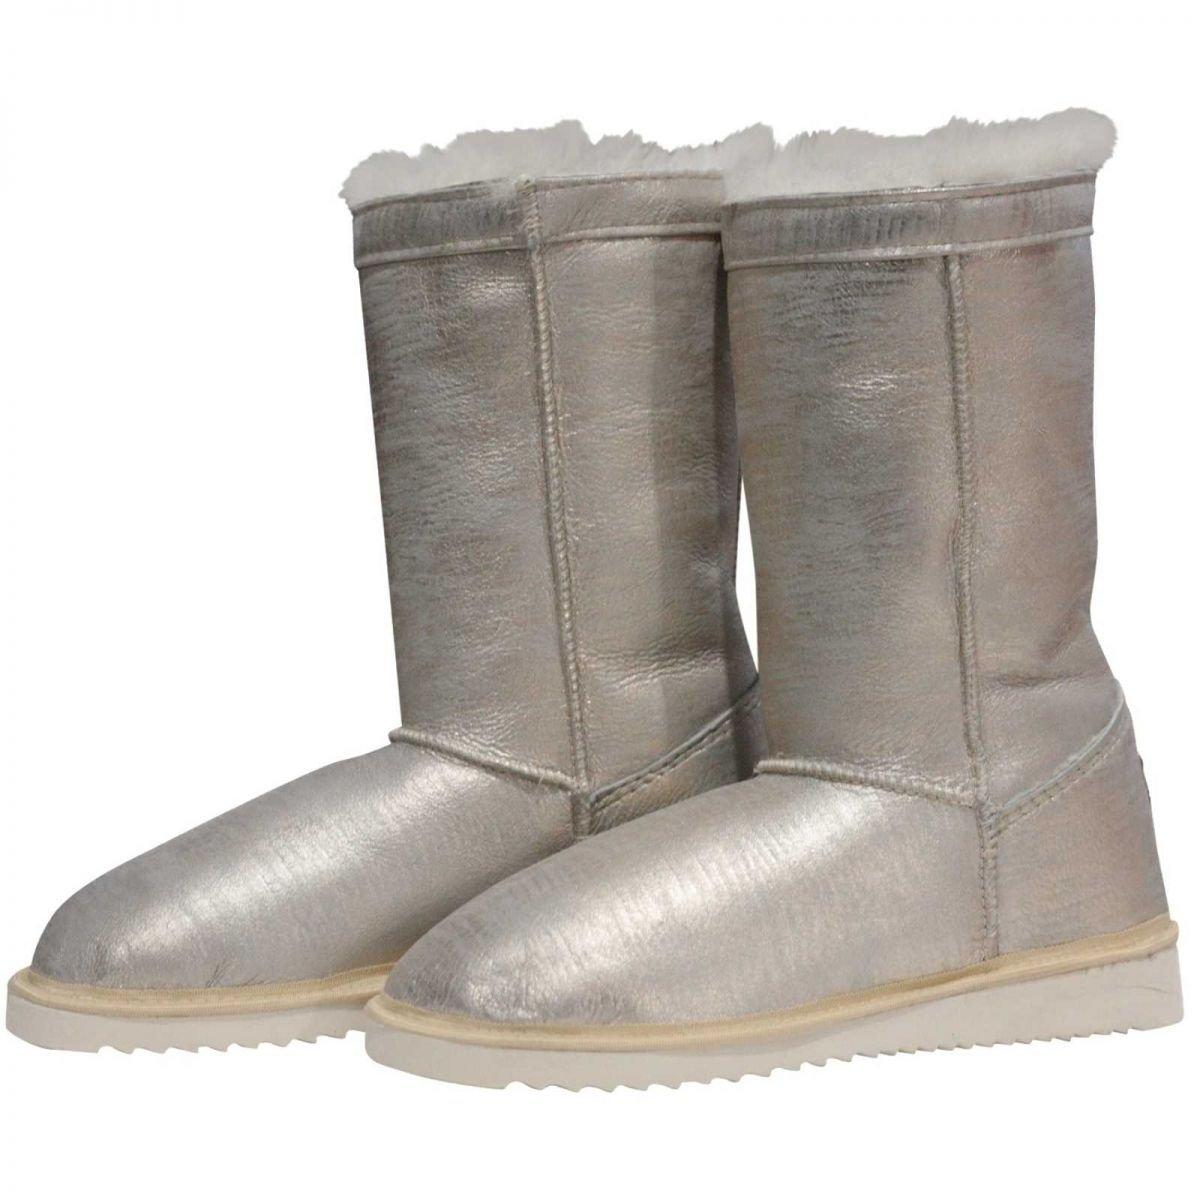 argentoo Hollert Geruomo Leather moda, Sautope da barca donna argentoo argentoo 36